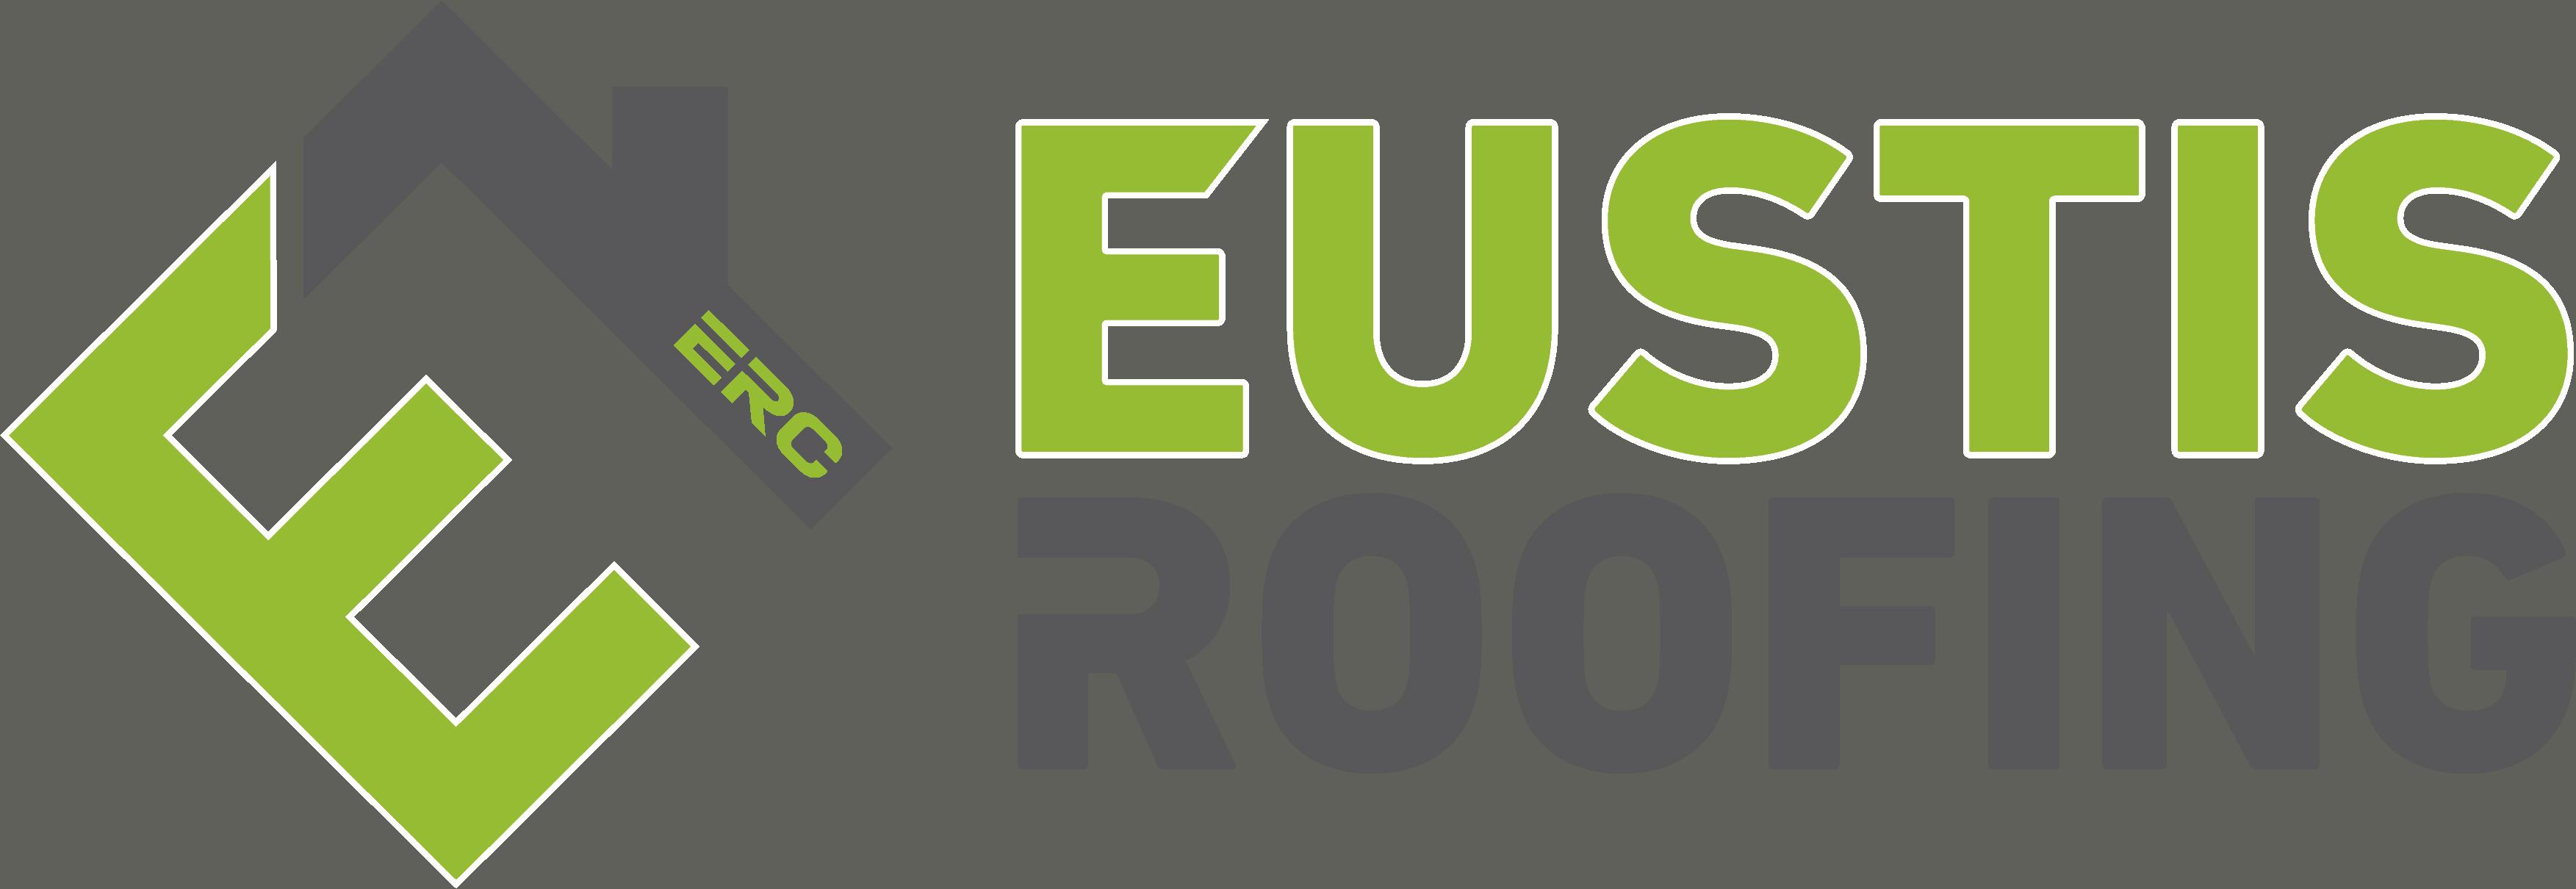 Eustis Roofing